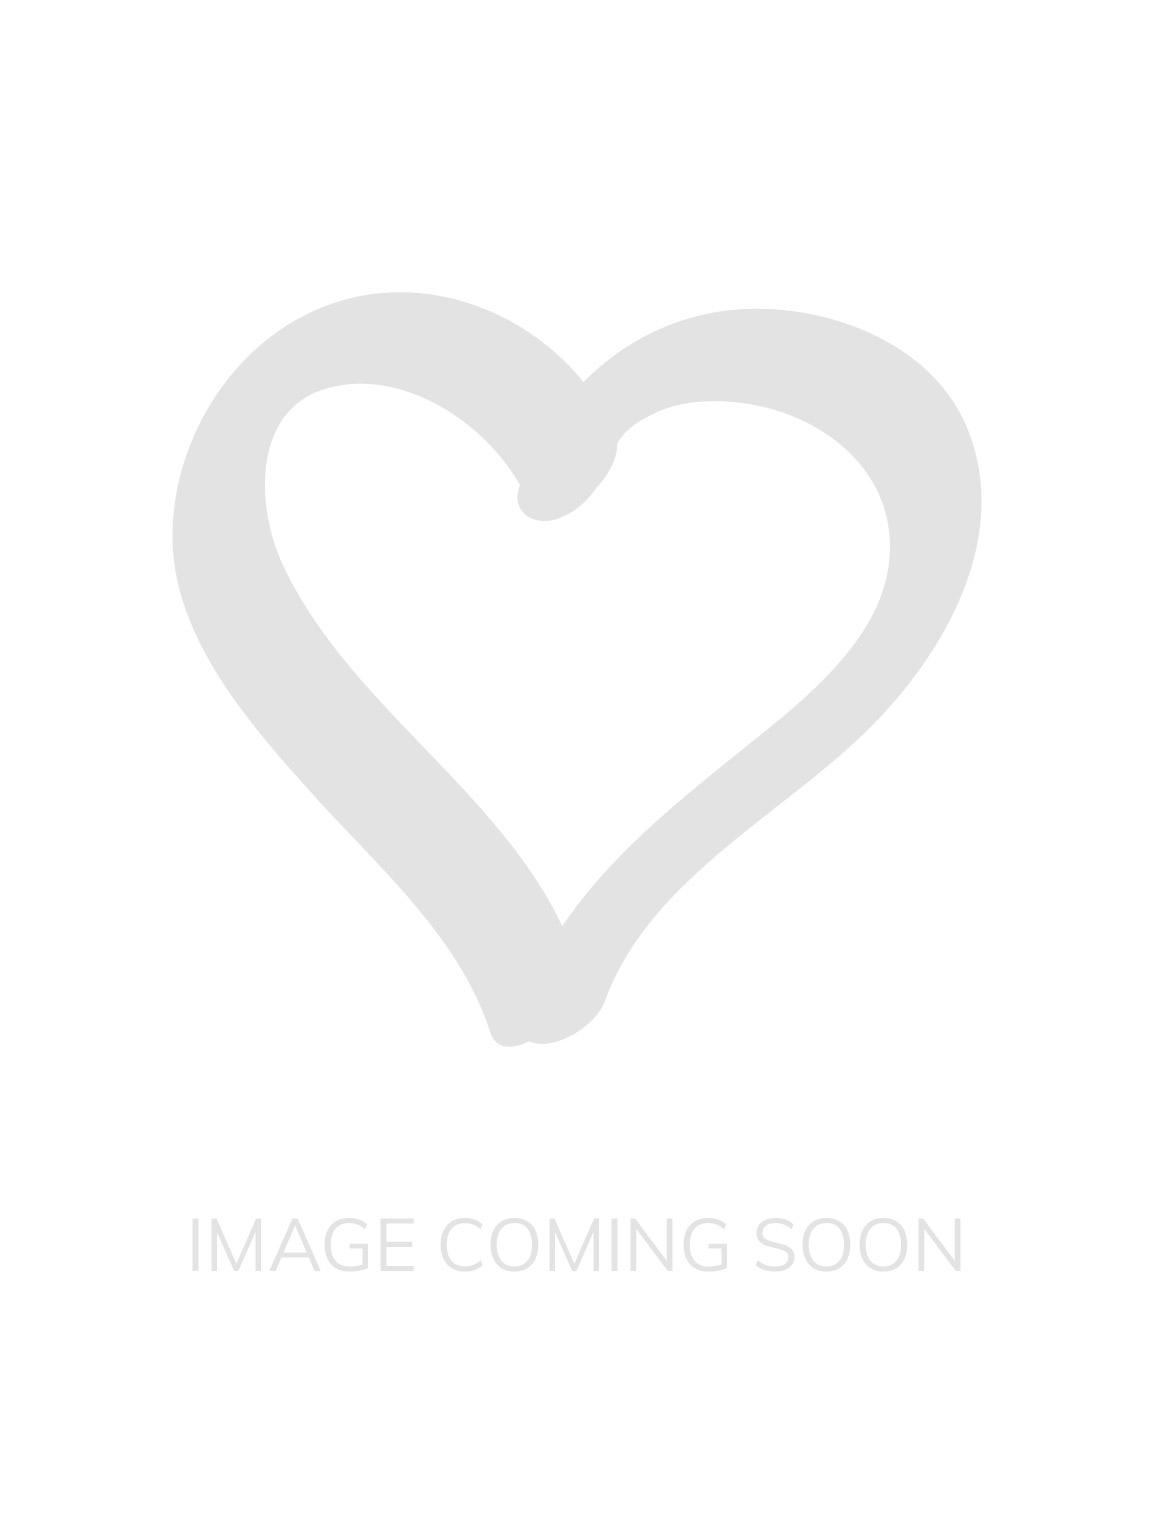 c13c546dc32 Boom Splice Jammer Swimming Trunks - Black   White